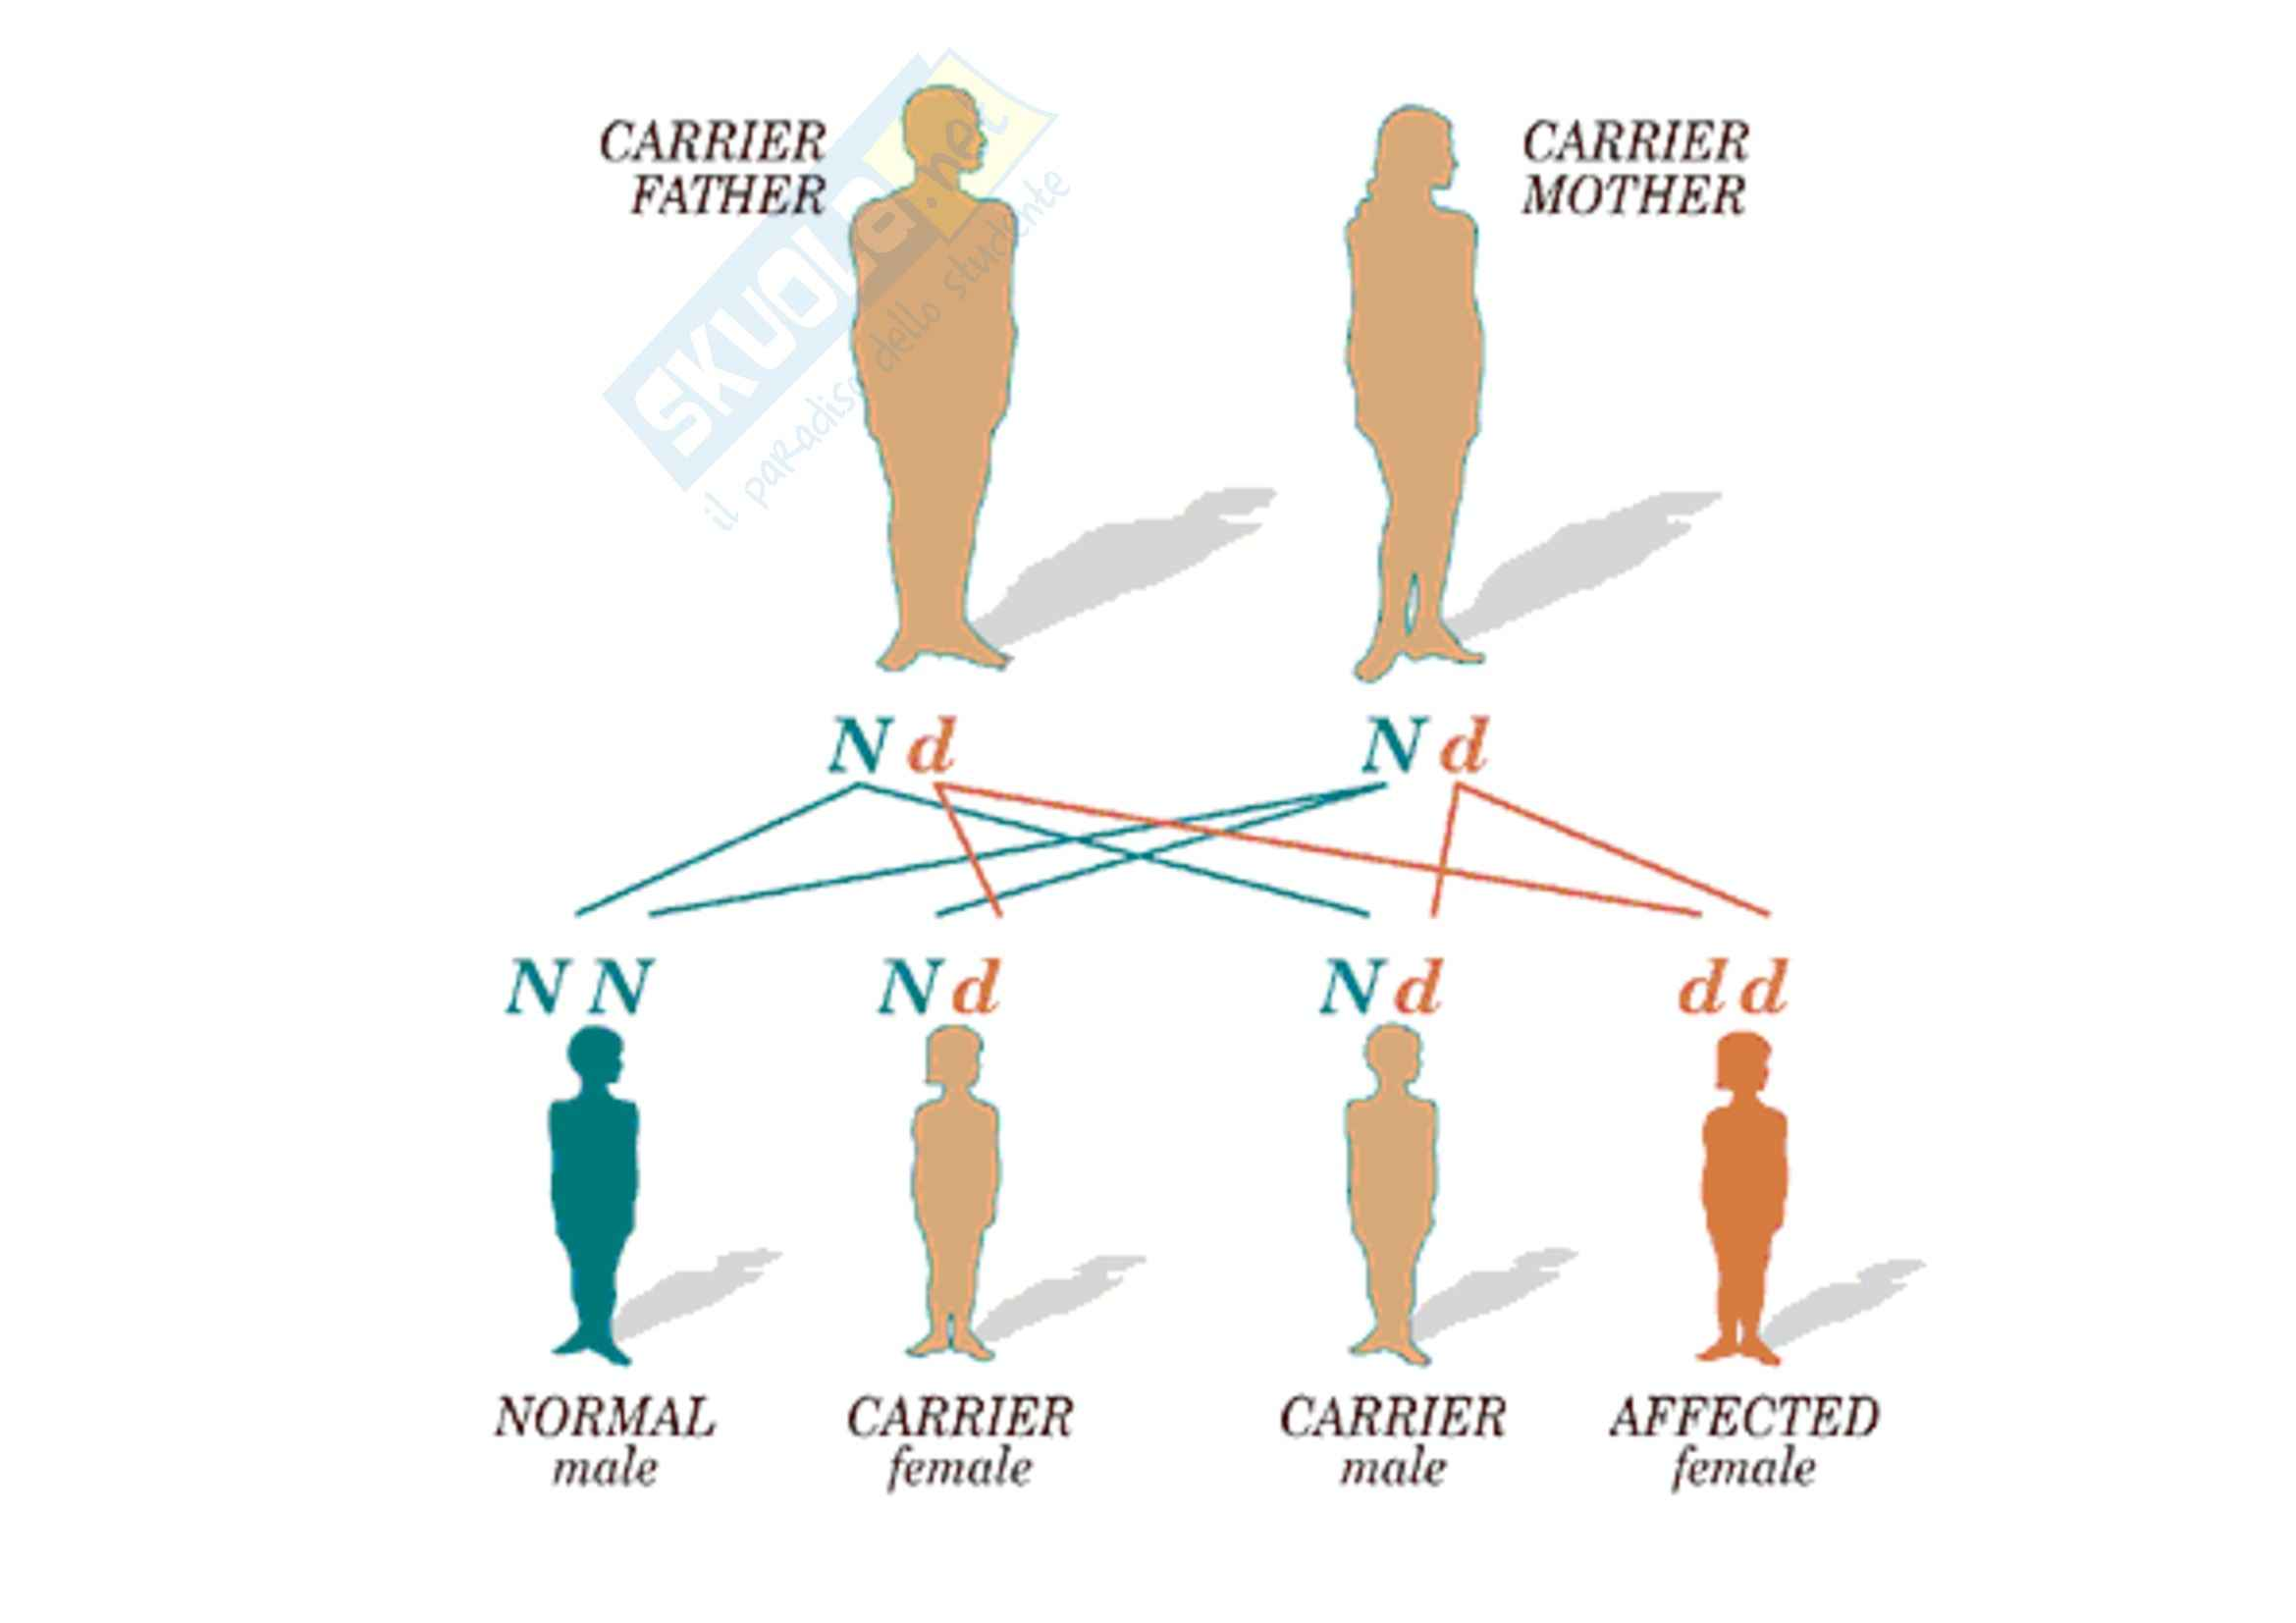 Genetica umana - alleli e Mendel - Appunti Pag. 41